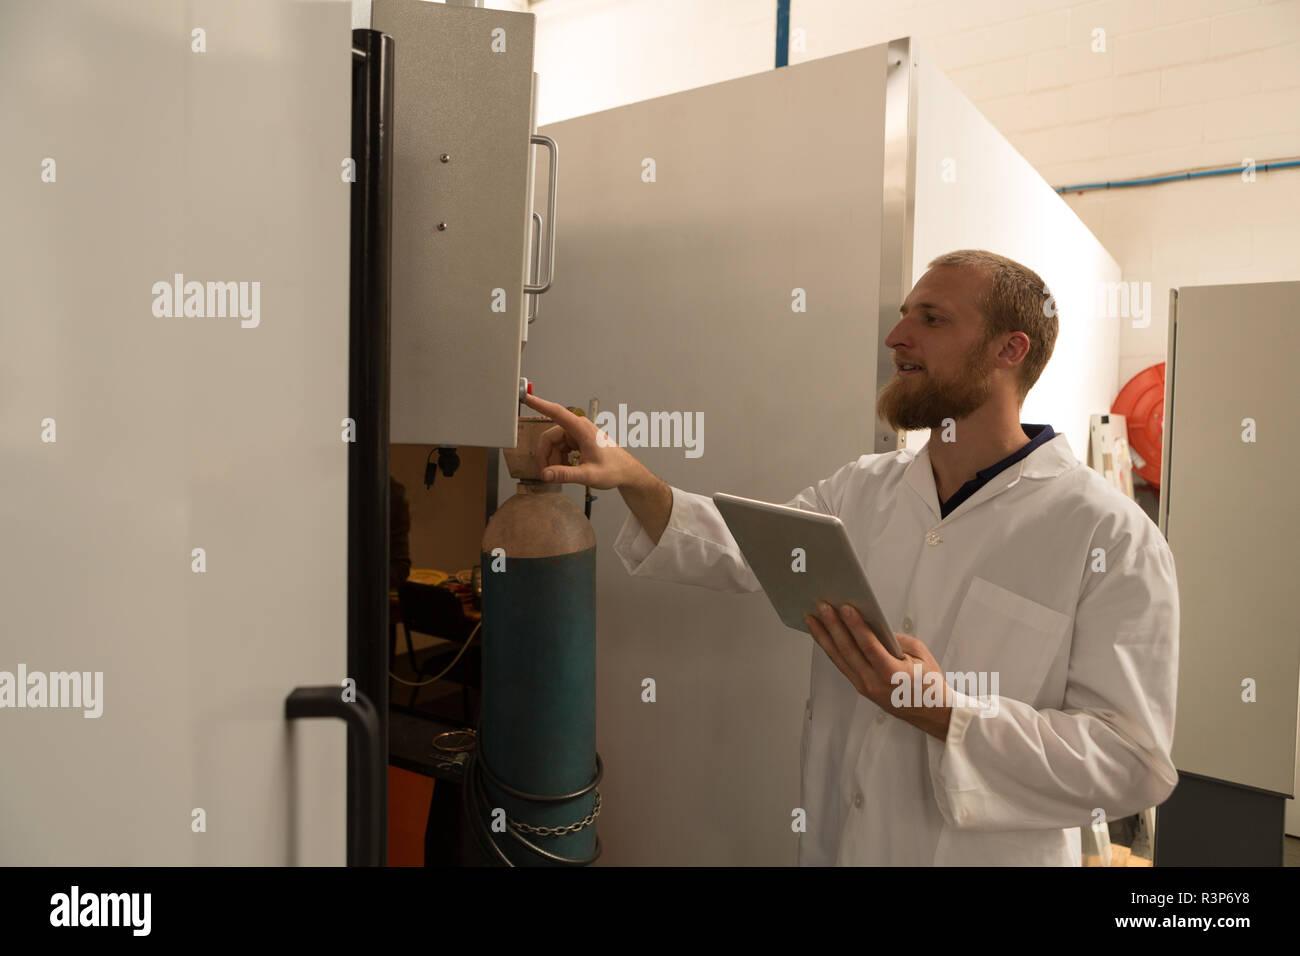 Robotics engineer controlling control panel - Stock Image